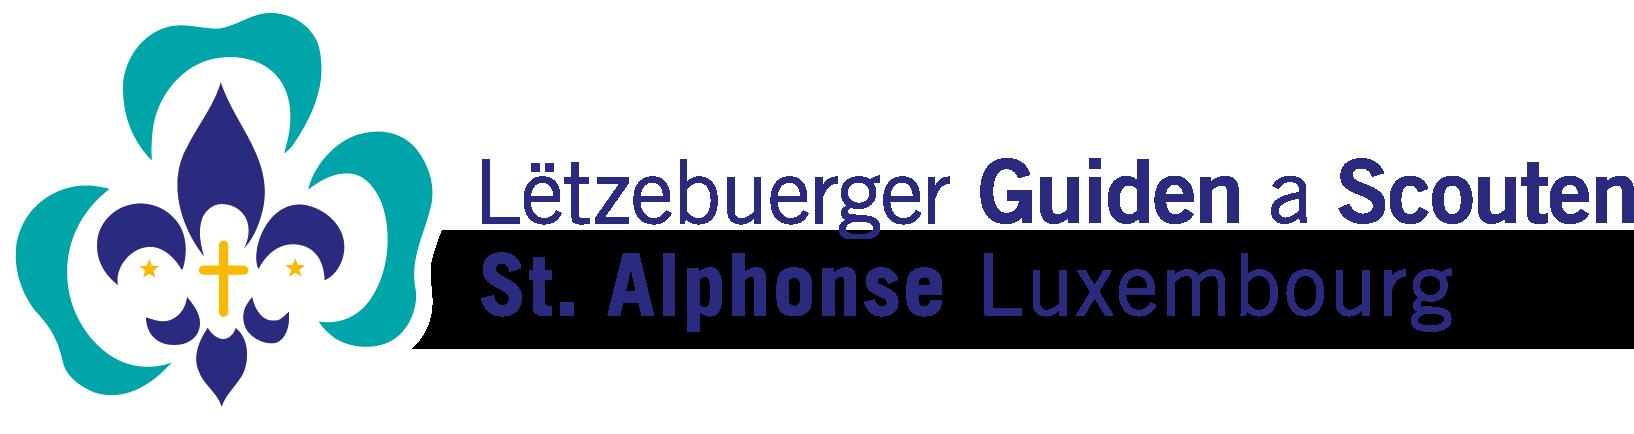 LGS St. Alphonse Luxembourg (AESA)